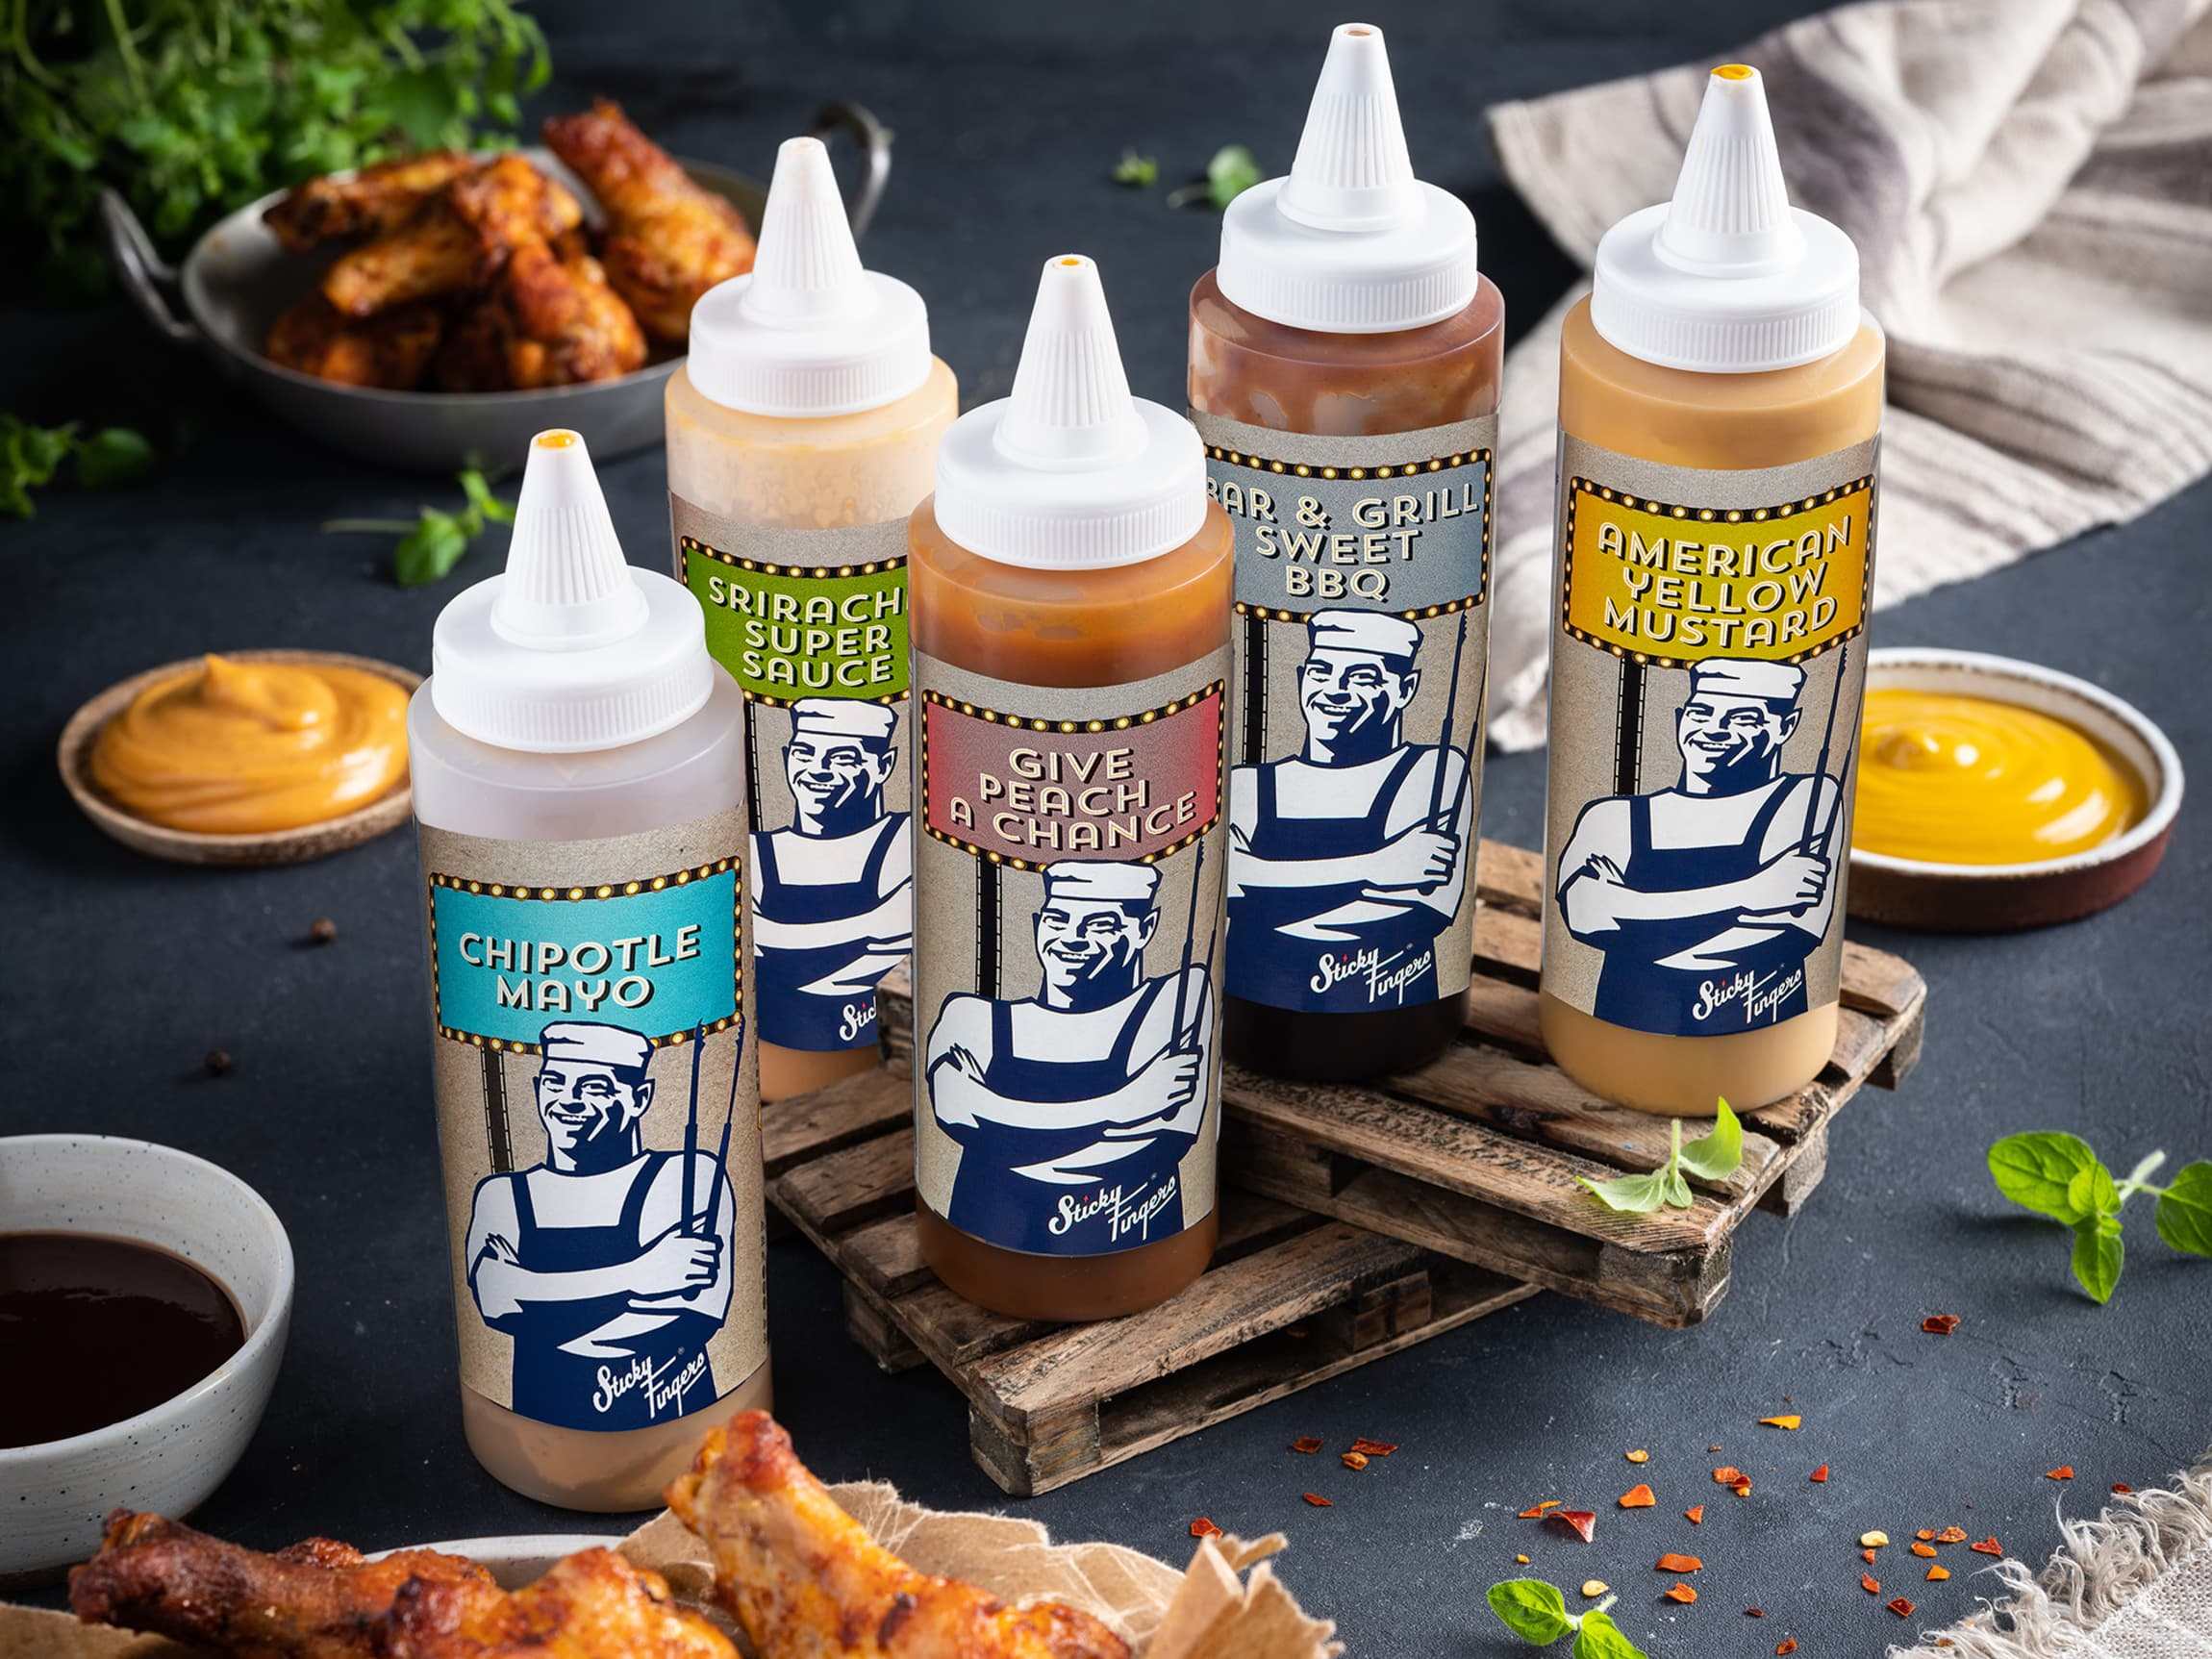 Prøv nye smaker på grillmaten i sommer!